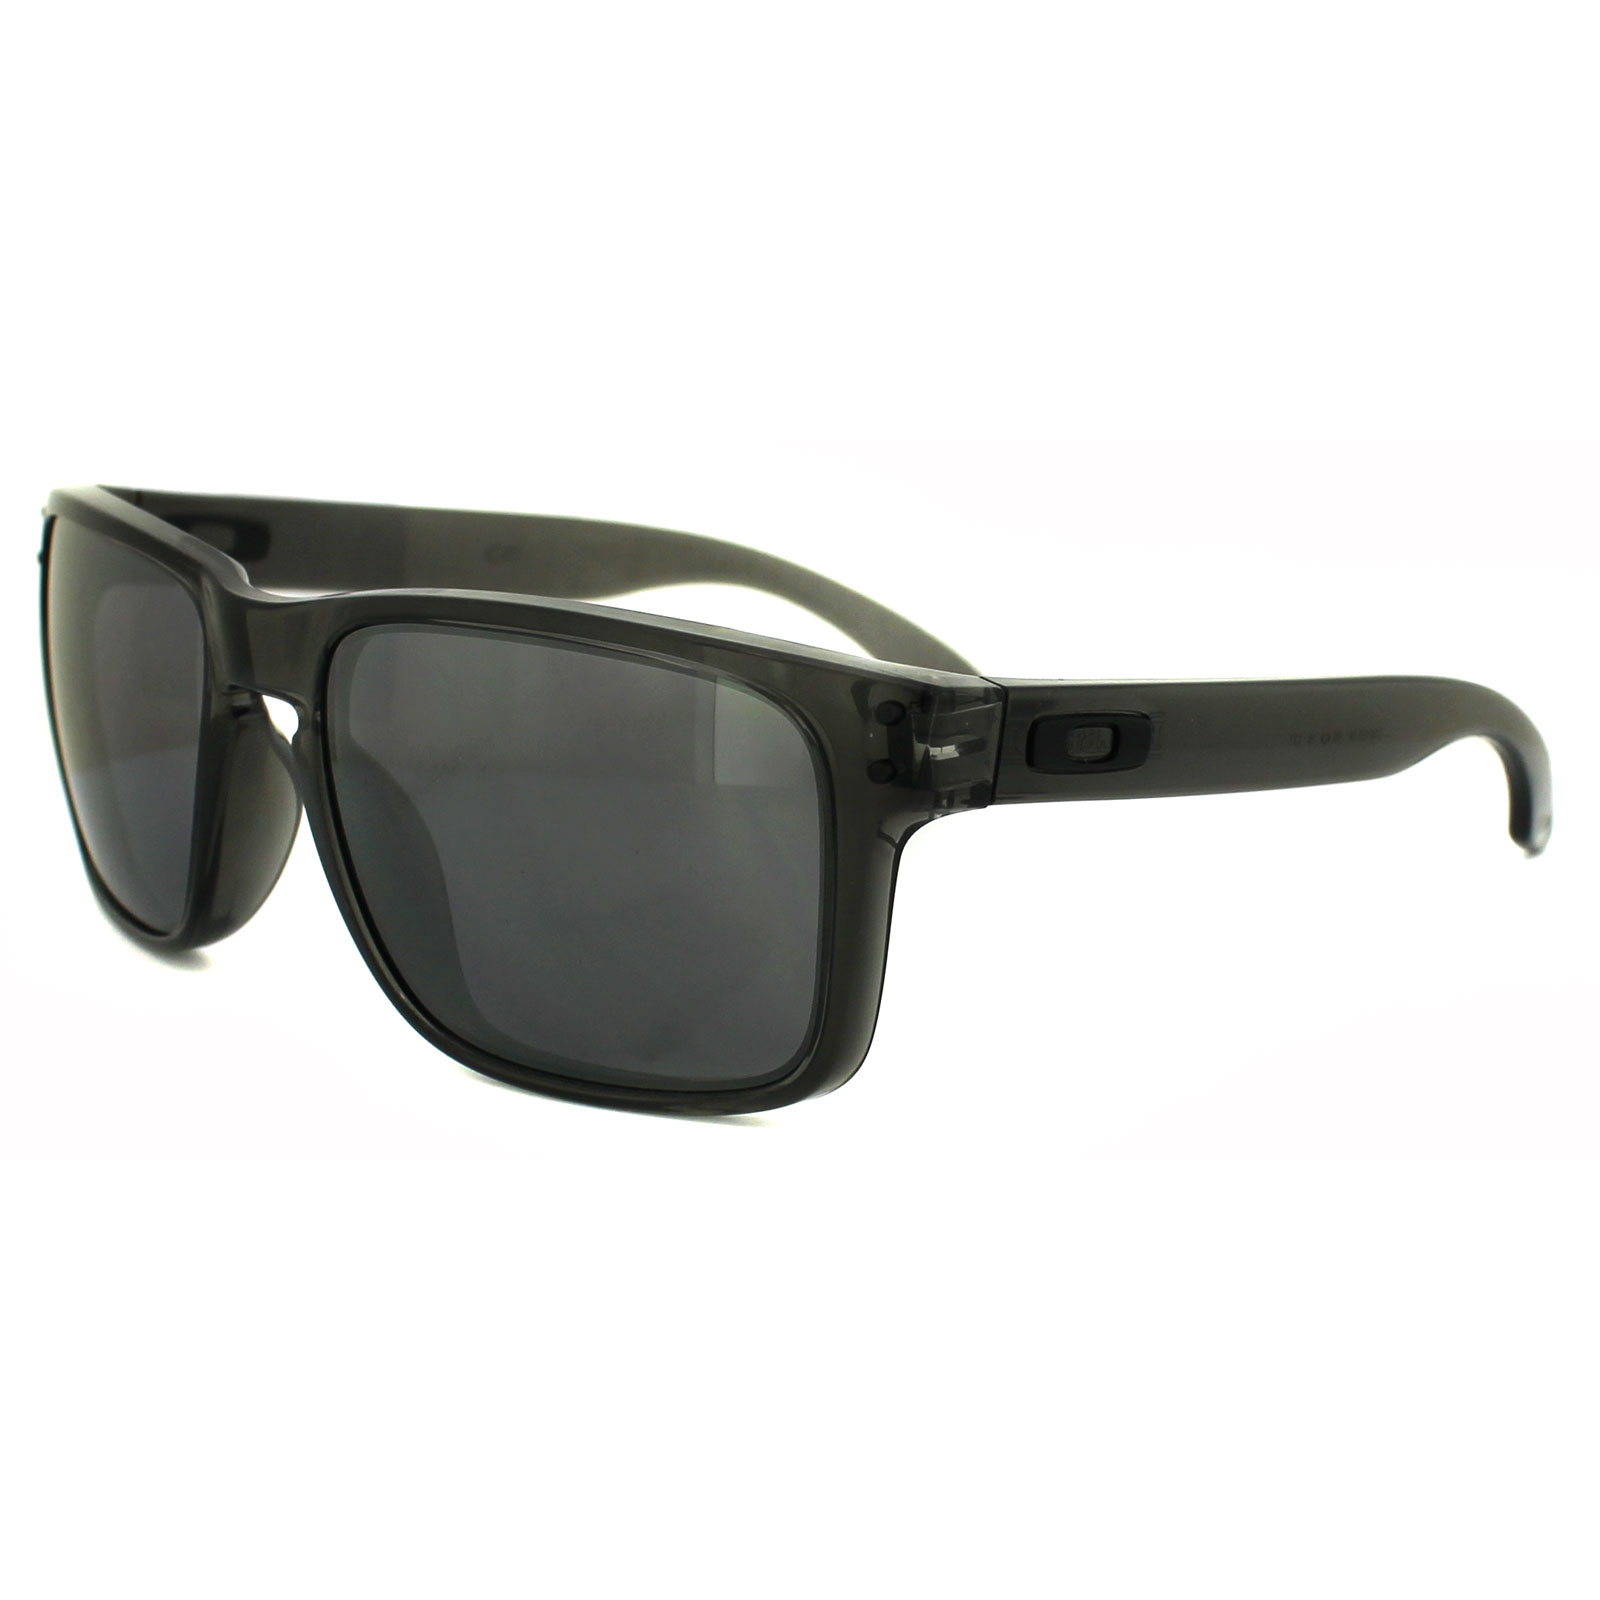 oakley sunglasses oo9102 holbrook ulyg  Sentinel Oakley Sunglasses Holbrook Grey Smoke Black OO9102-24